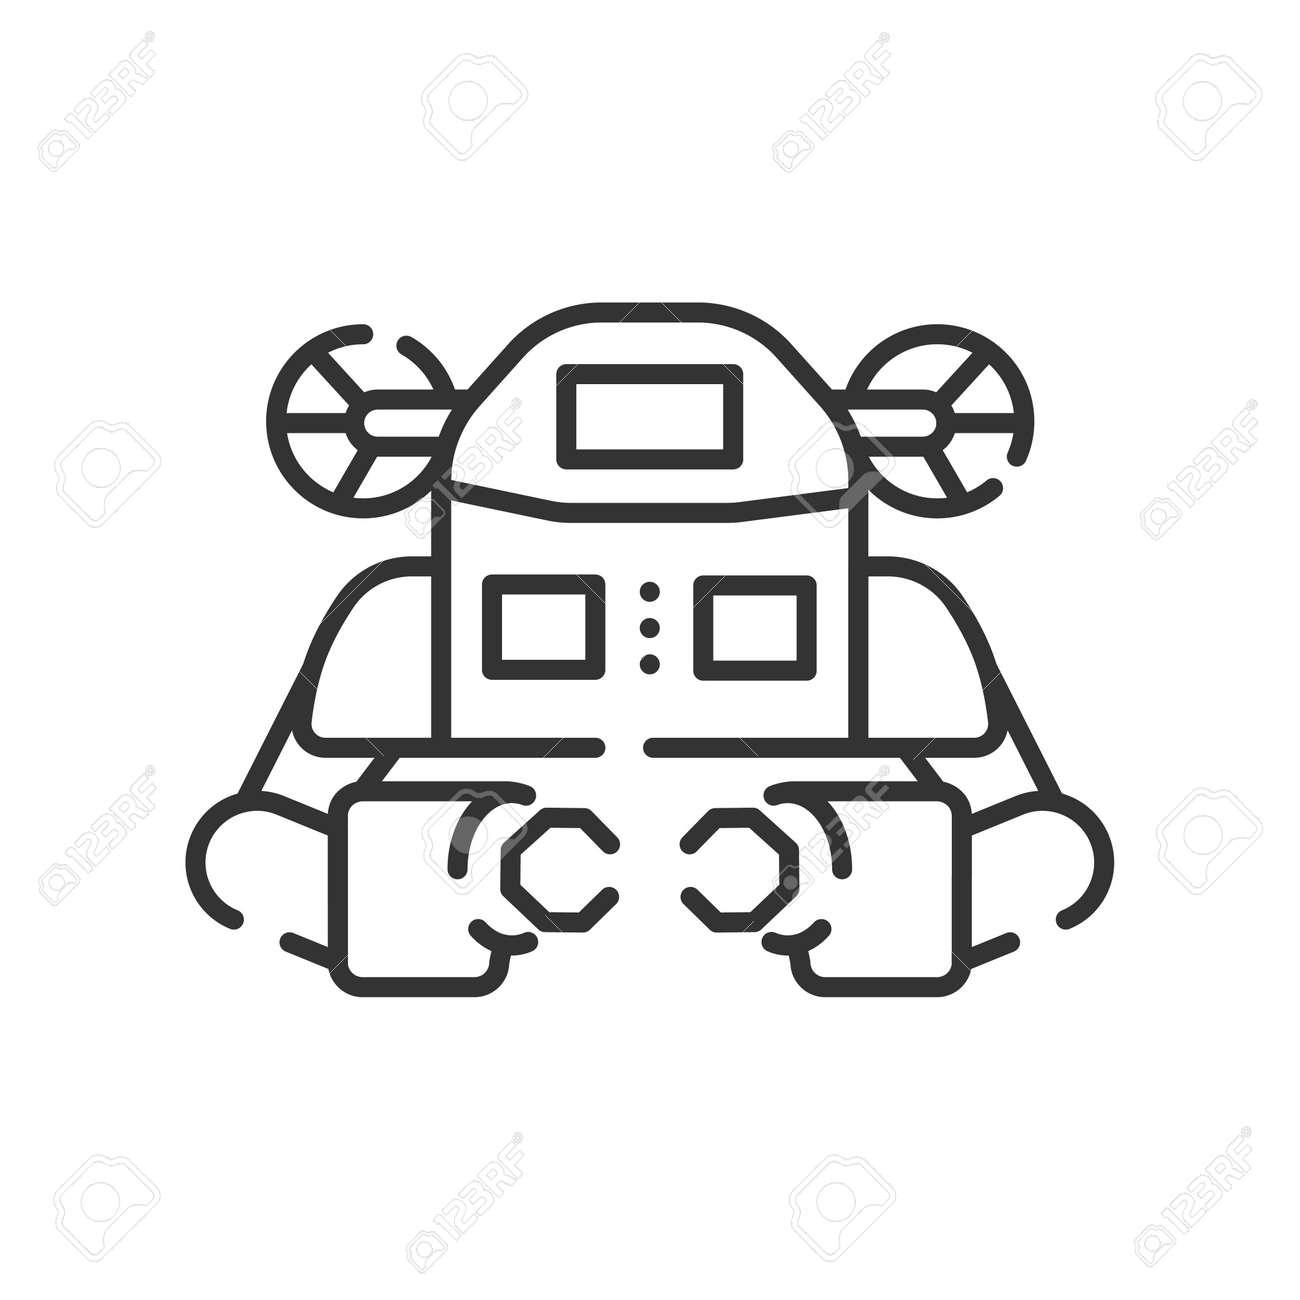 Underwater robot black line icon. Aquanaut, an autonomous electric submarine. Innovation in technology. Sign for web page, app. UI UX GUI design element. Editable stroke - 137467037